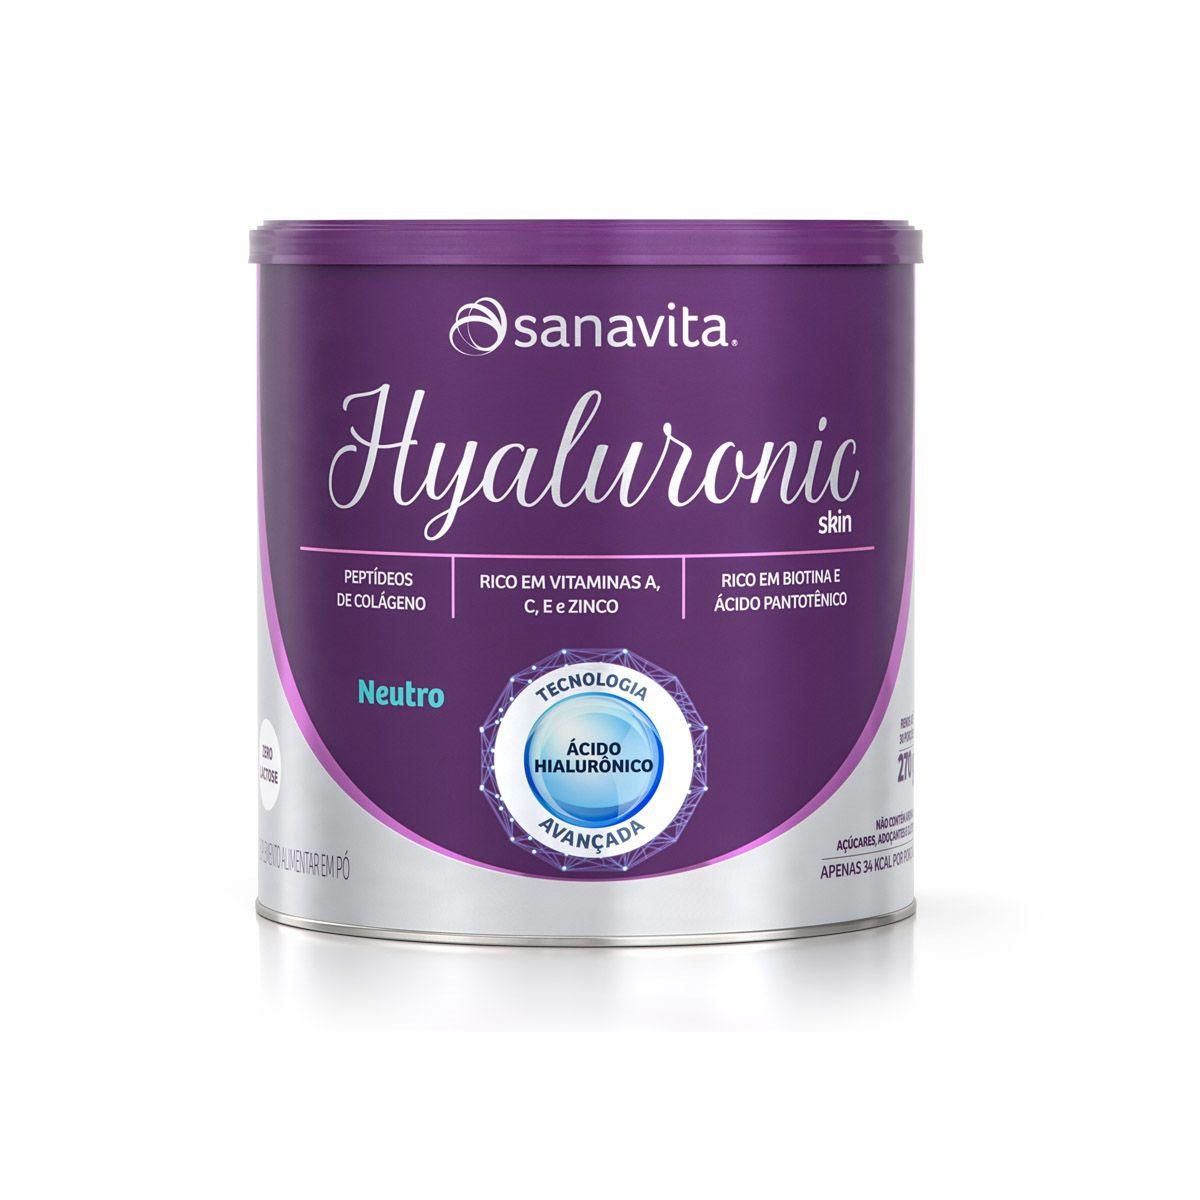 Hyaluronic Skin - 270g - Sanavita